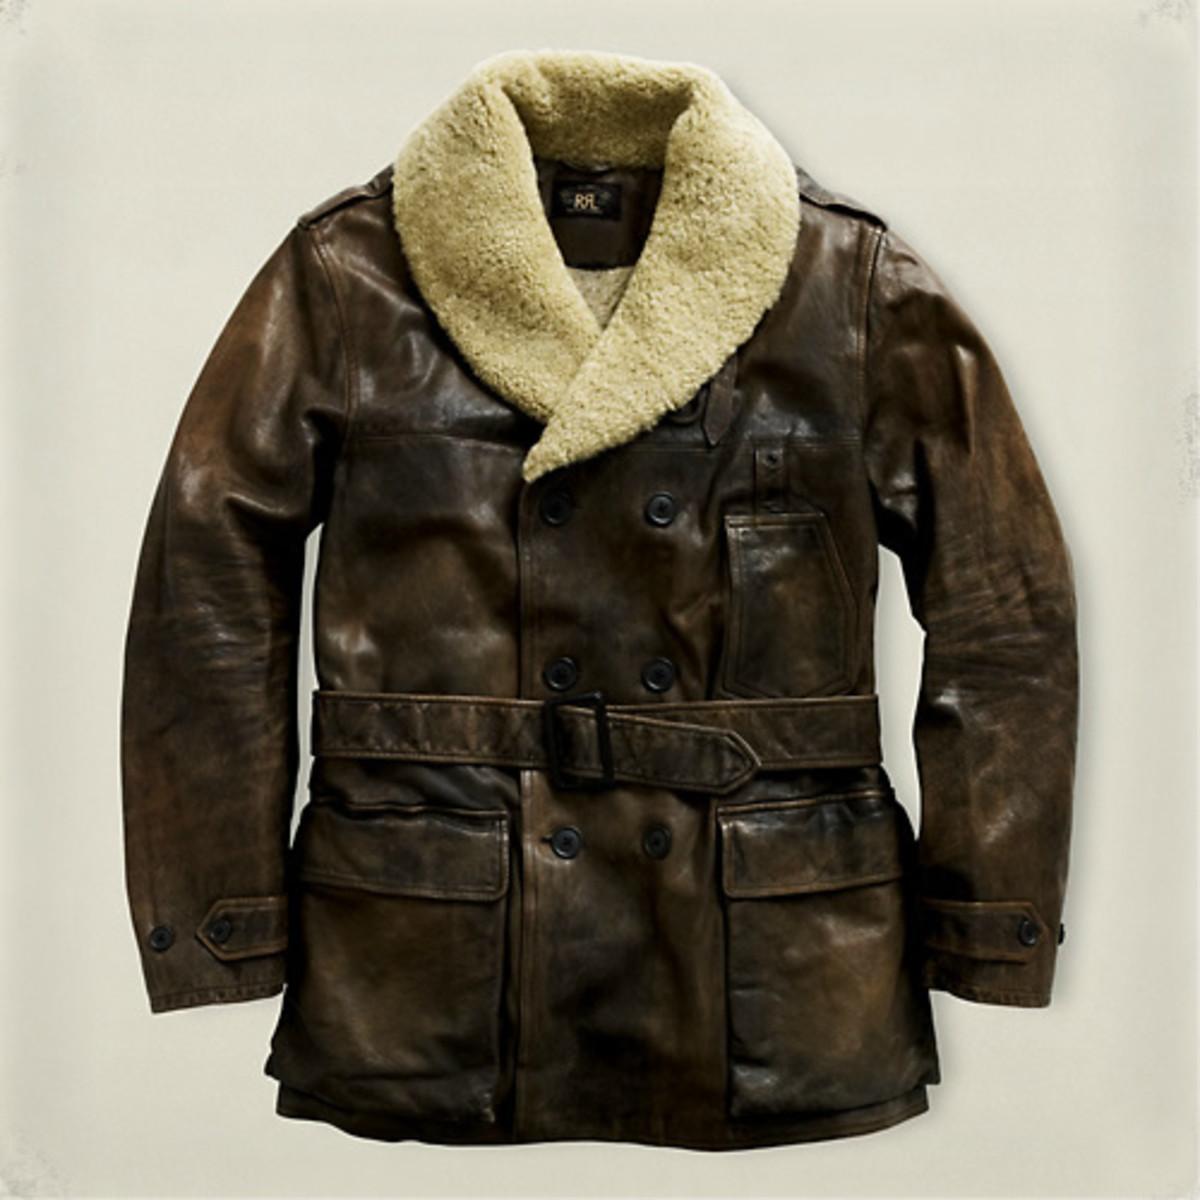 Rrl Flight Jacket Acquire